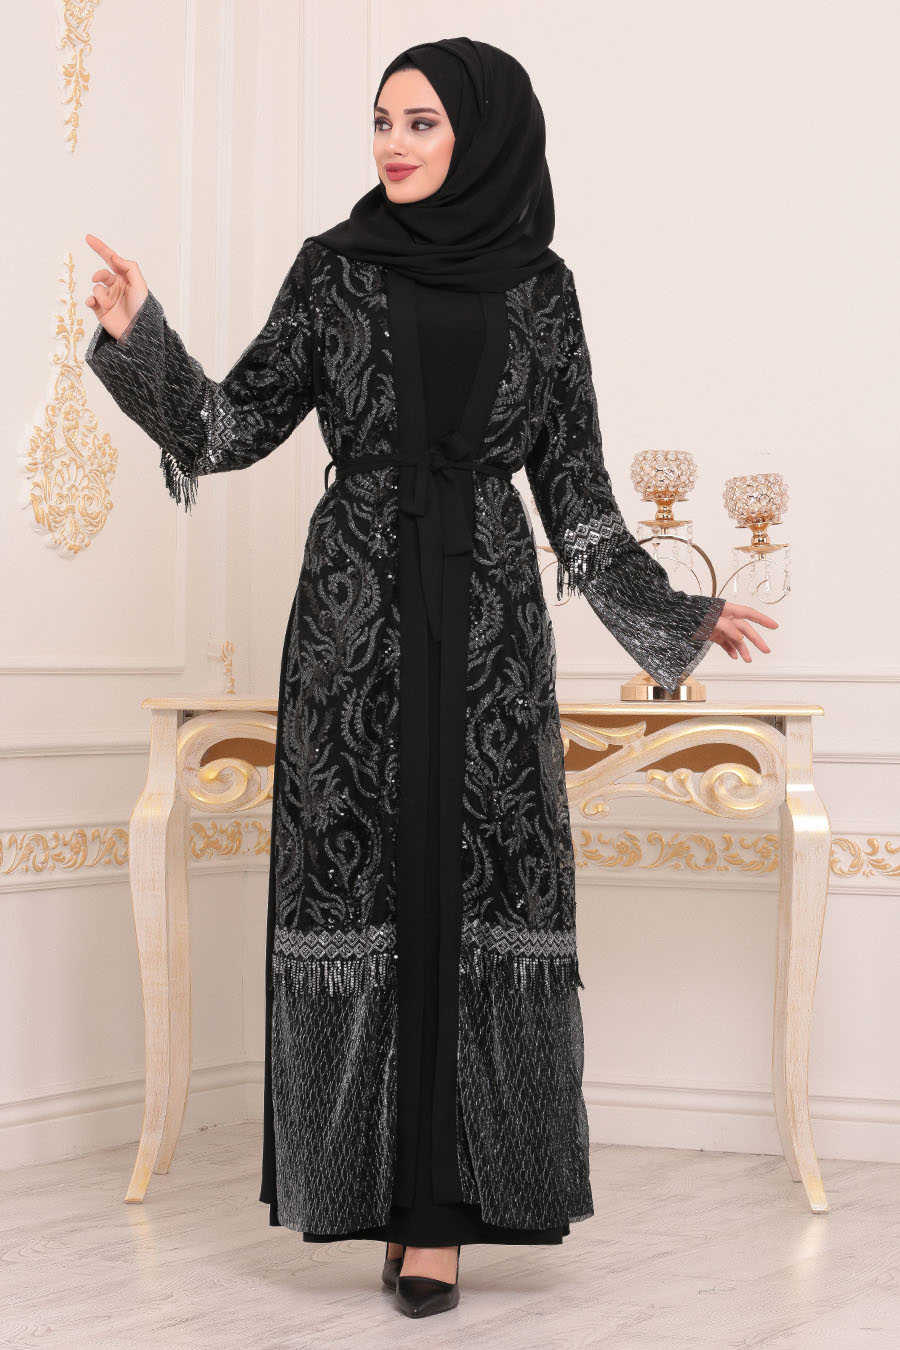 Neva Style - Black Hijab Abaya 9590S